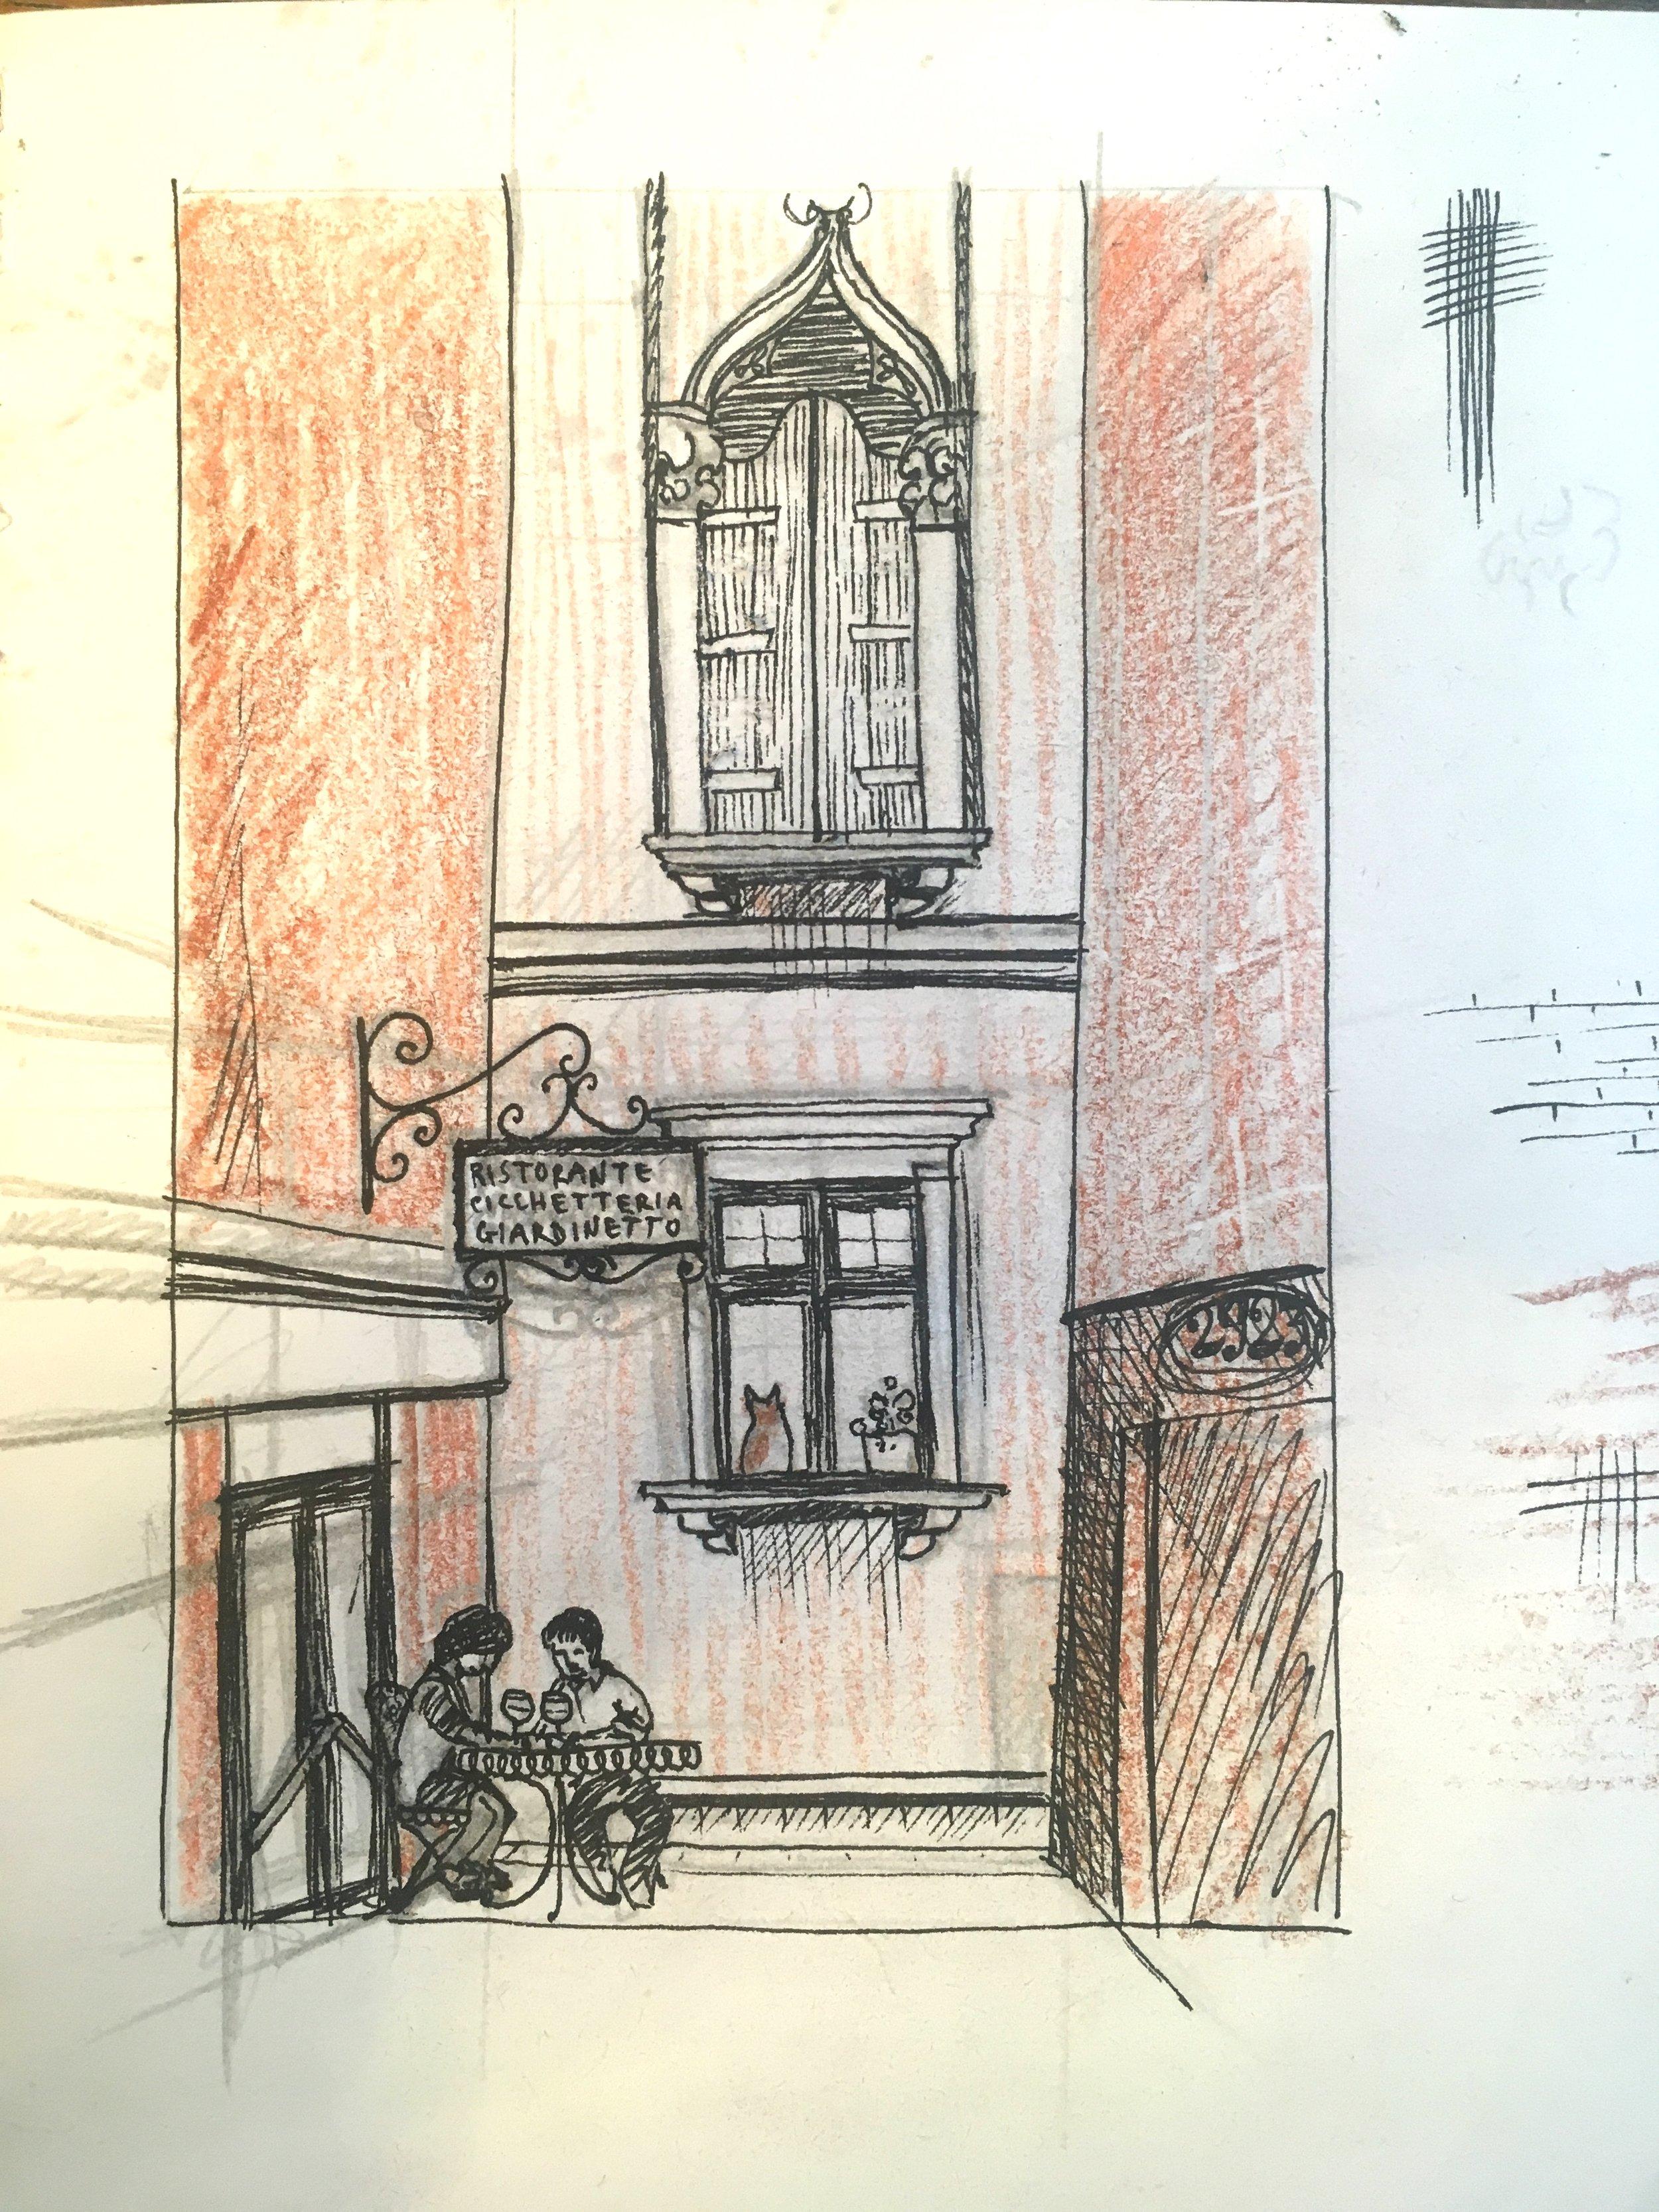 An initial sketch